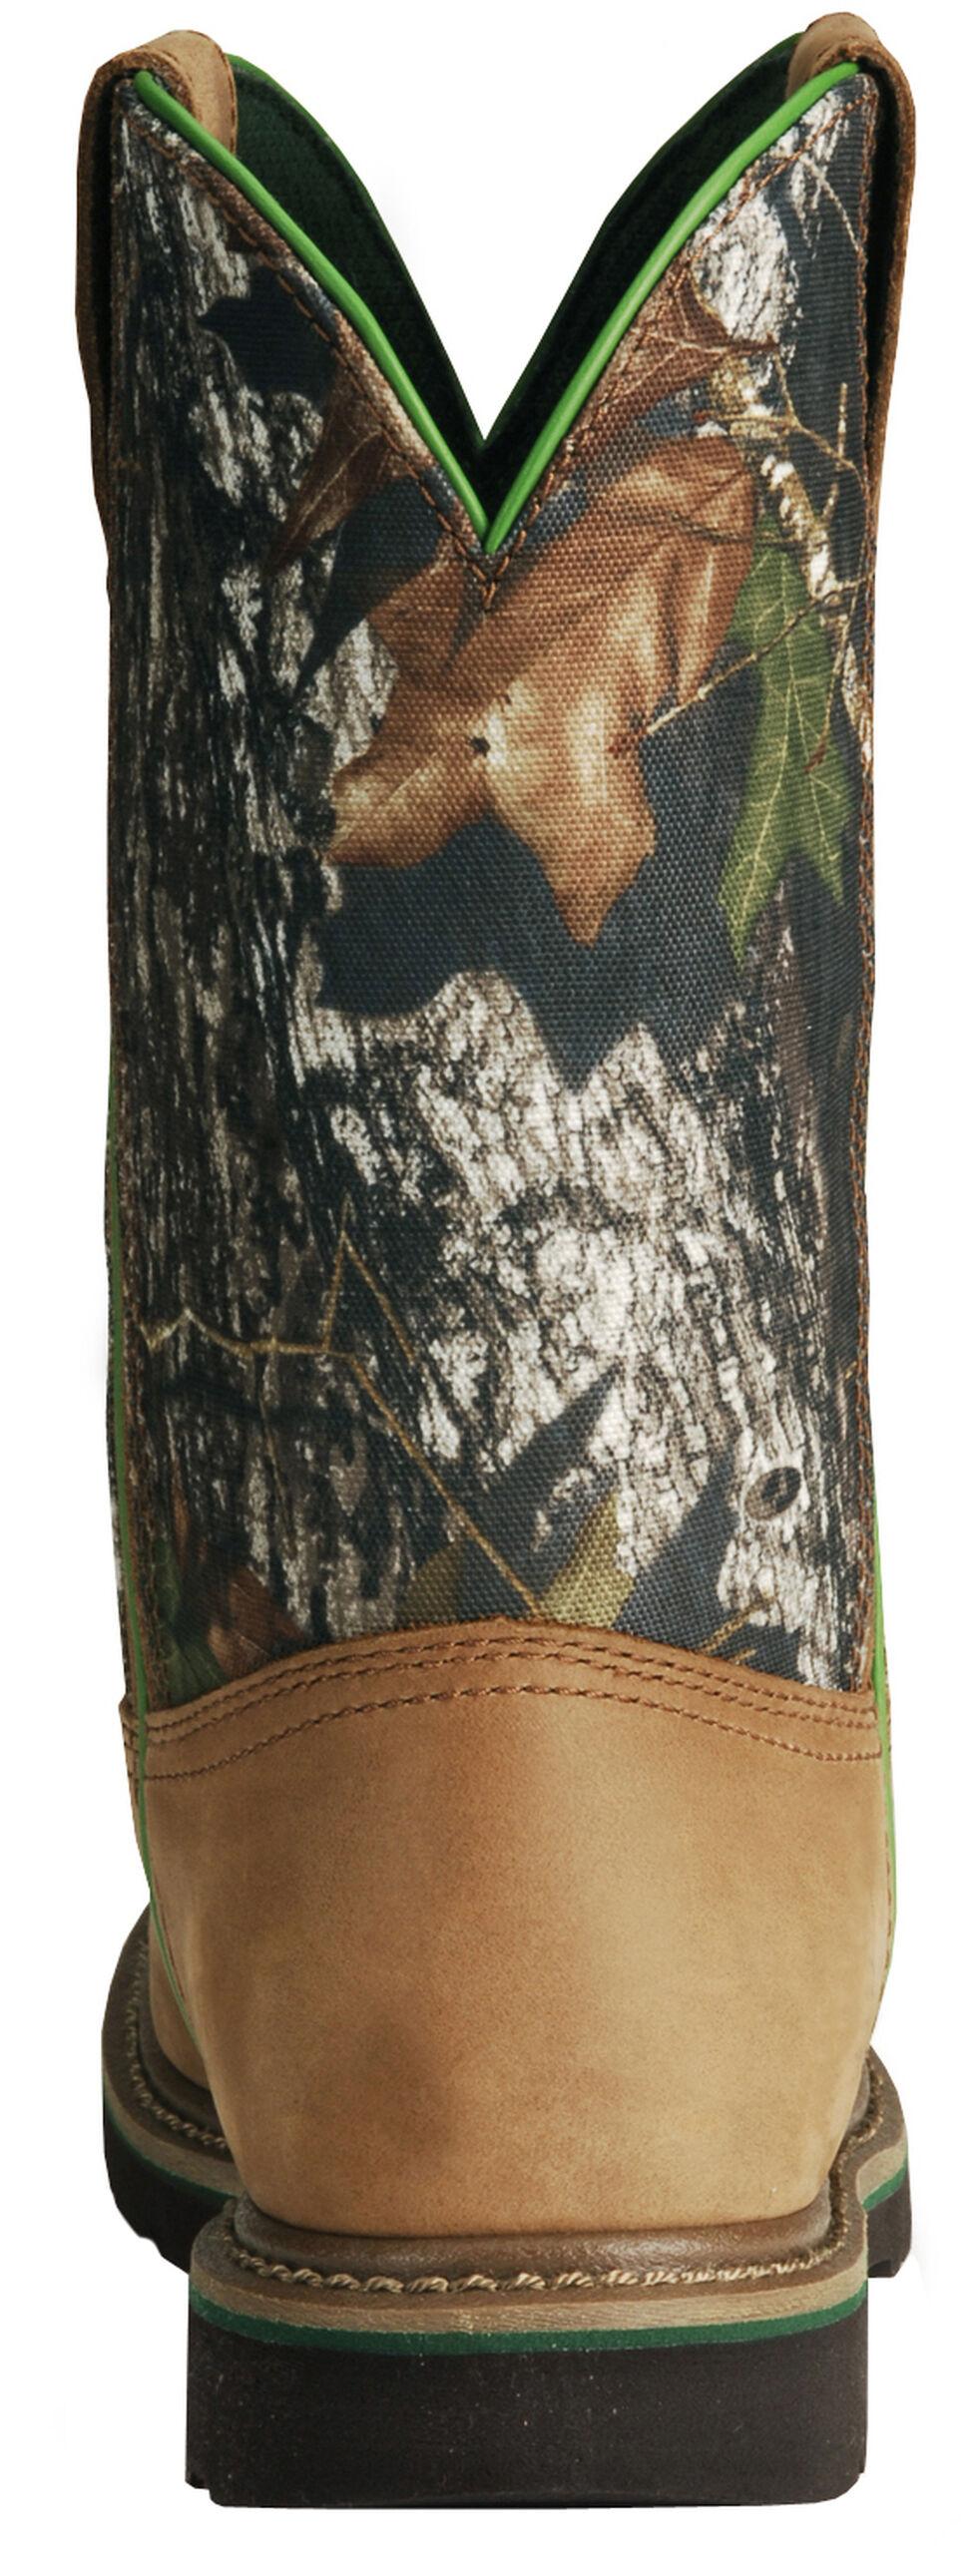 John Deere Mossy Oak Camo Wellington Work Boots - Soft Toe, Tan, hi-res